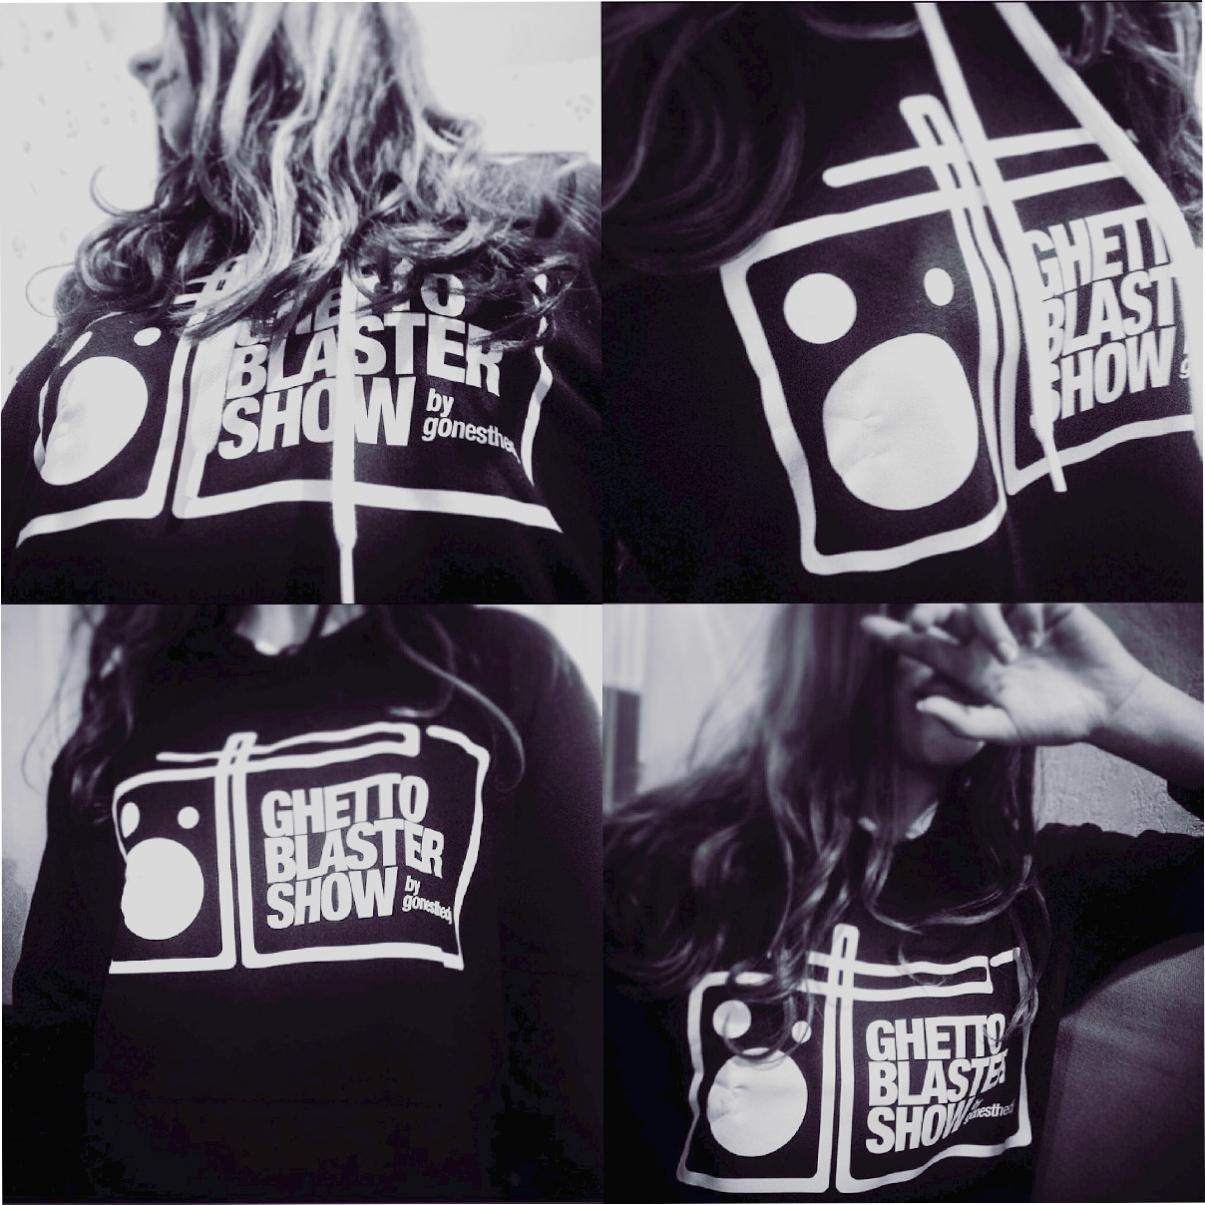 Ghetto Blaster Show logo Sweatshirt - © Olivier Varma